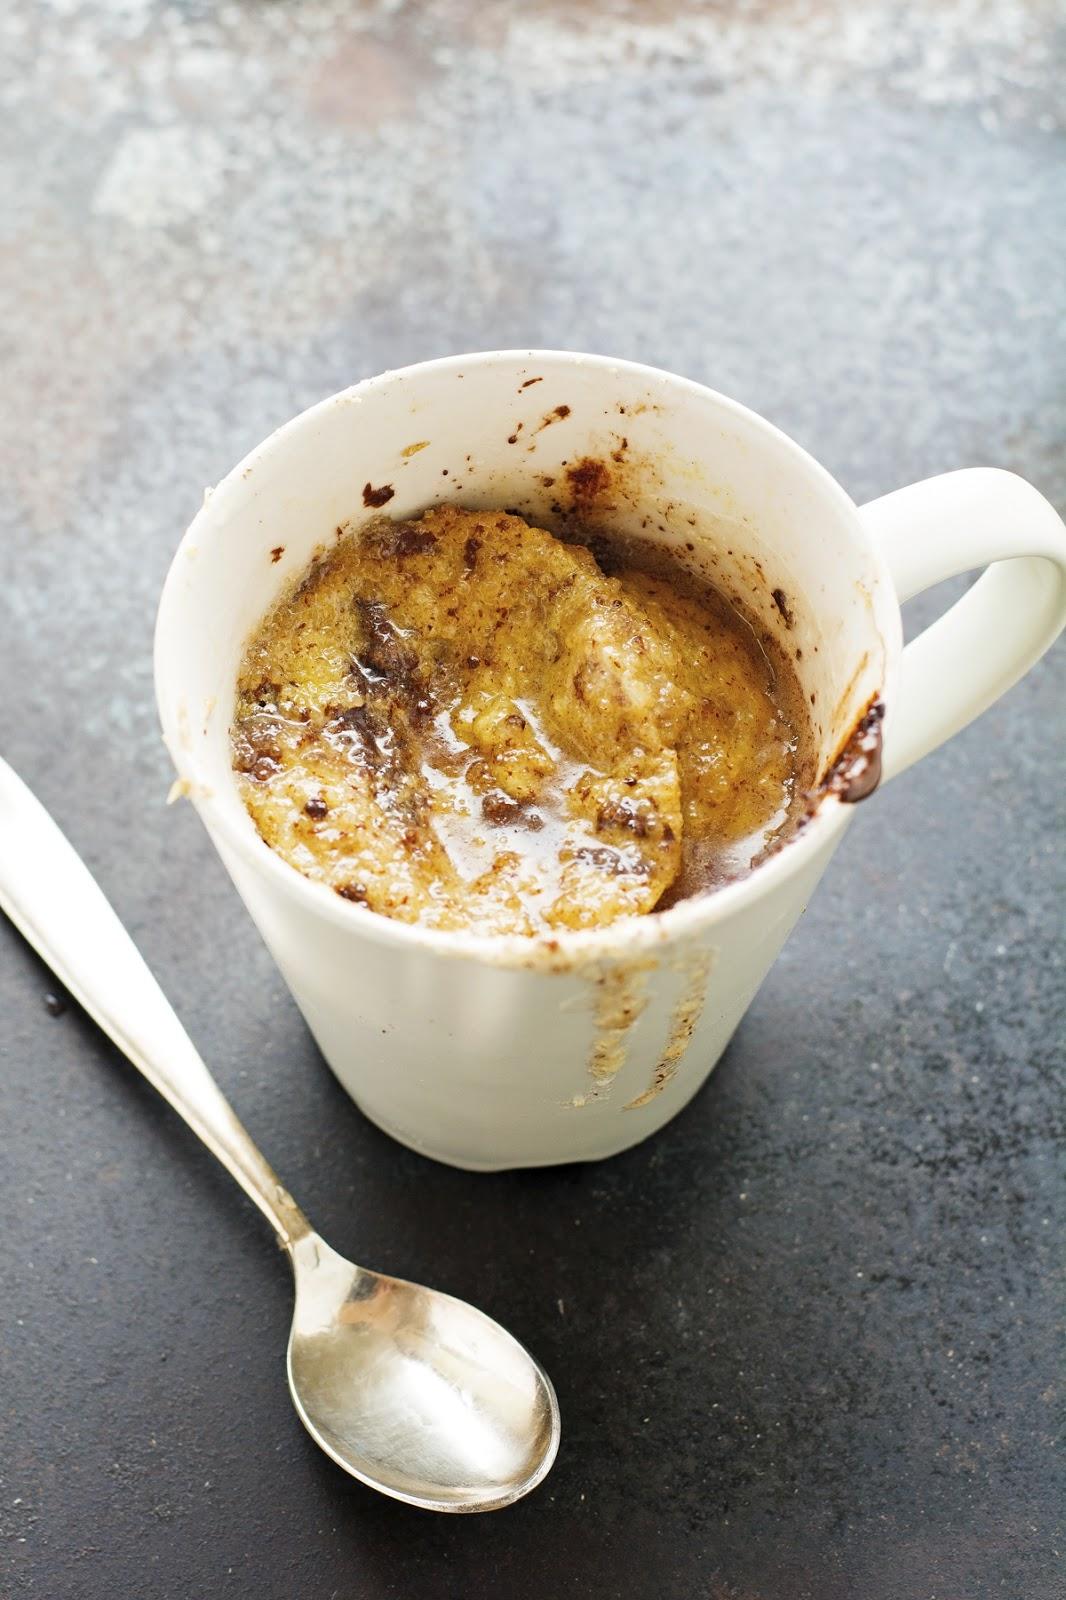 (Paleo) Banana Bread in a Mug with Lemon Glaze